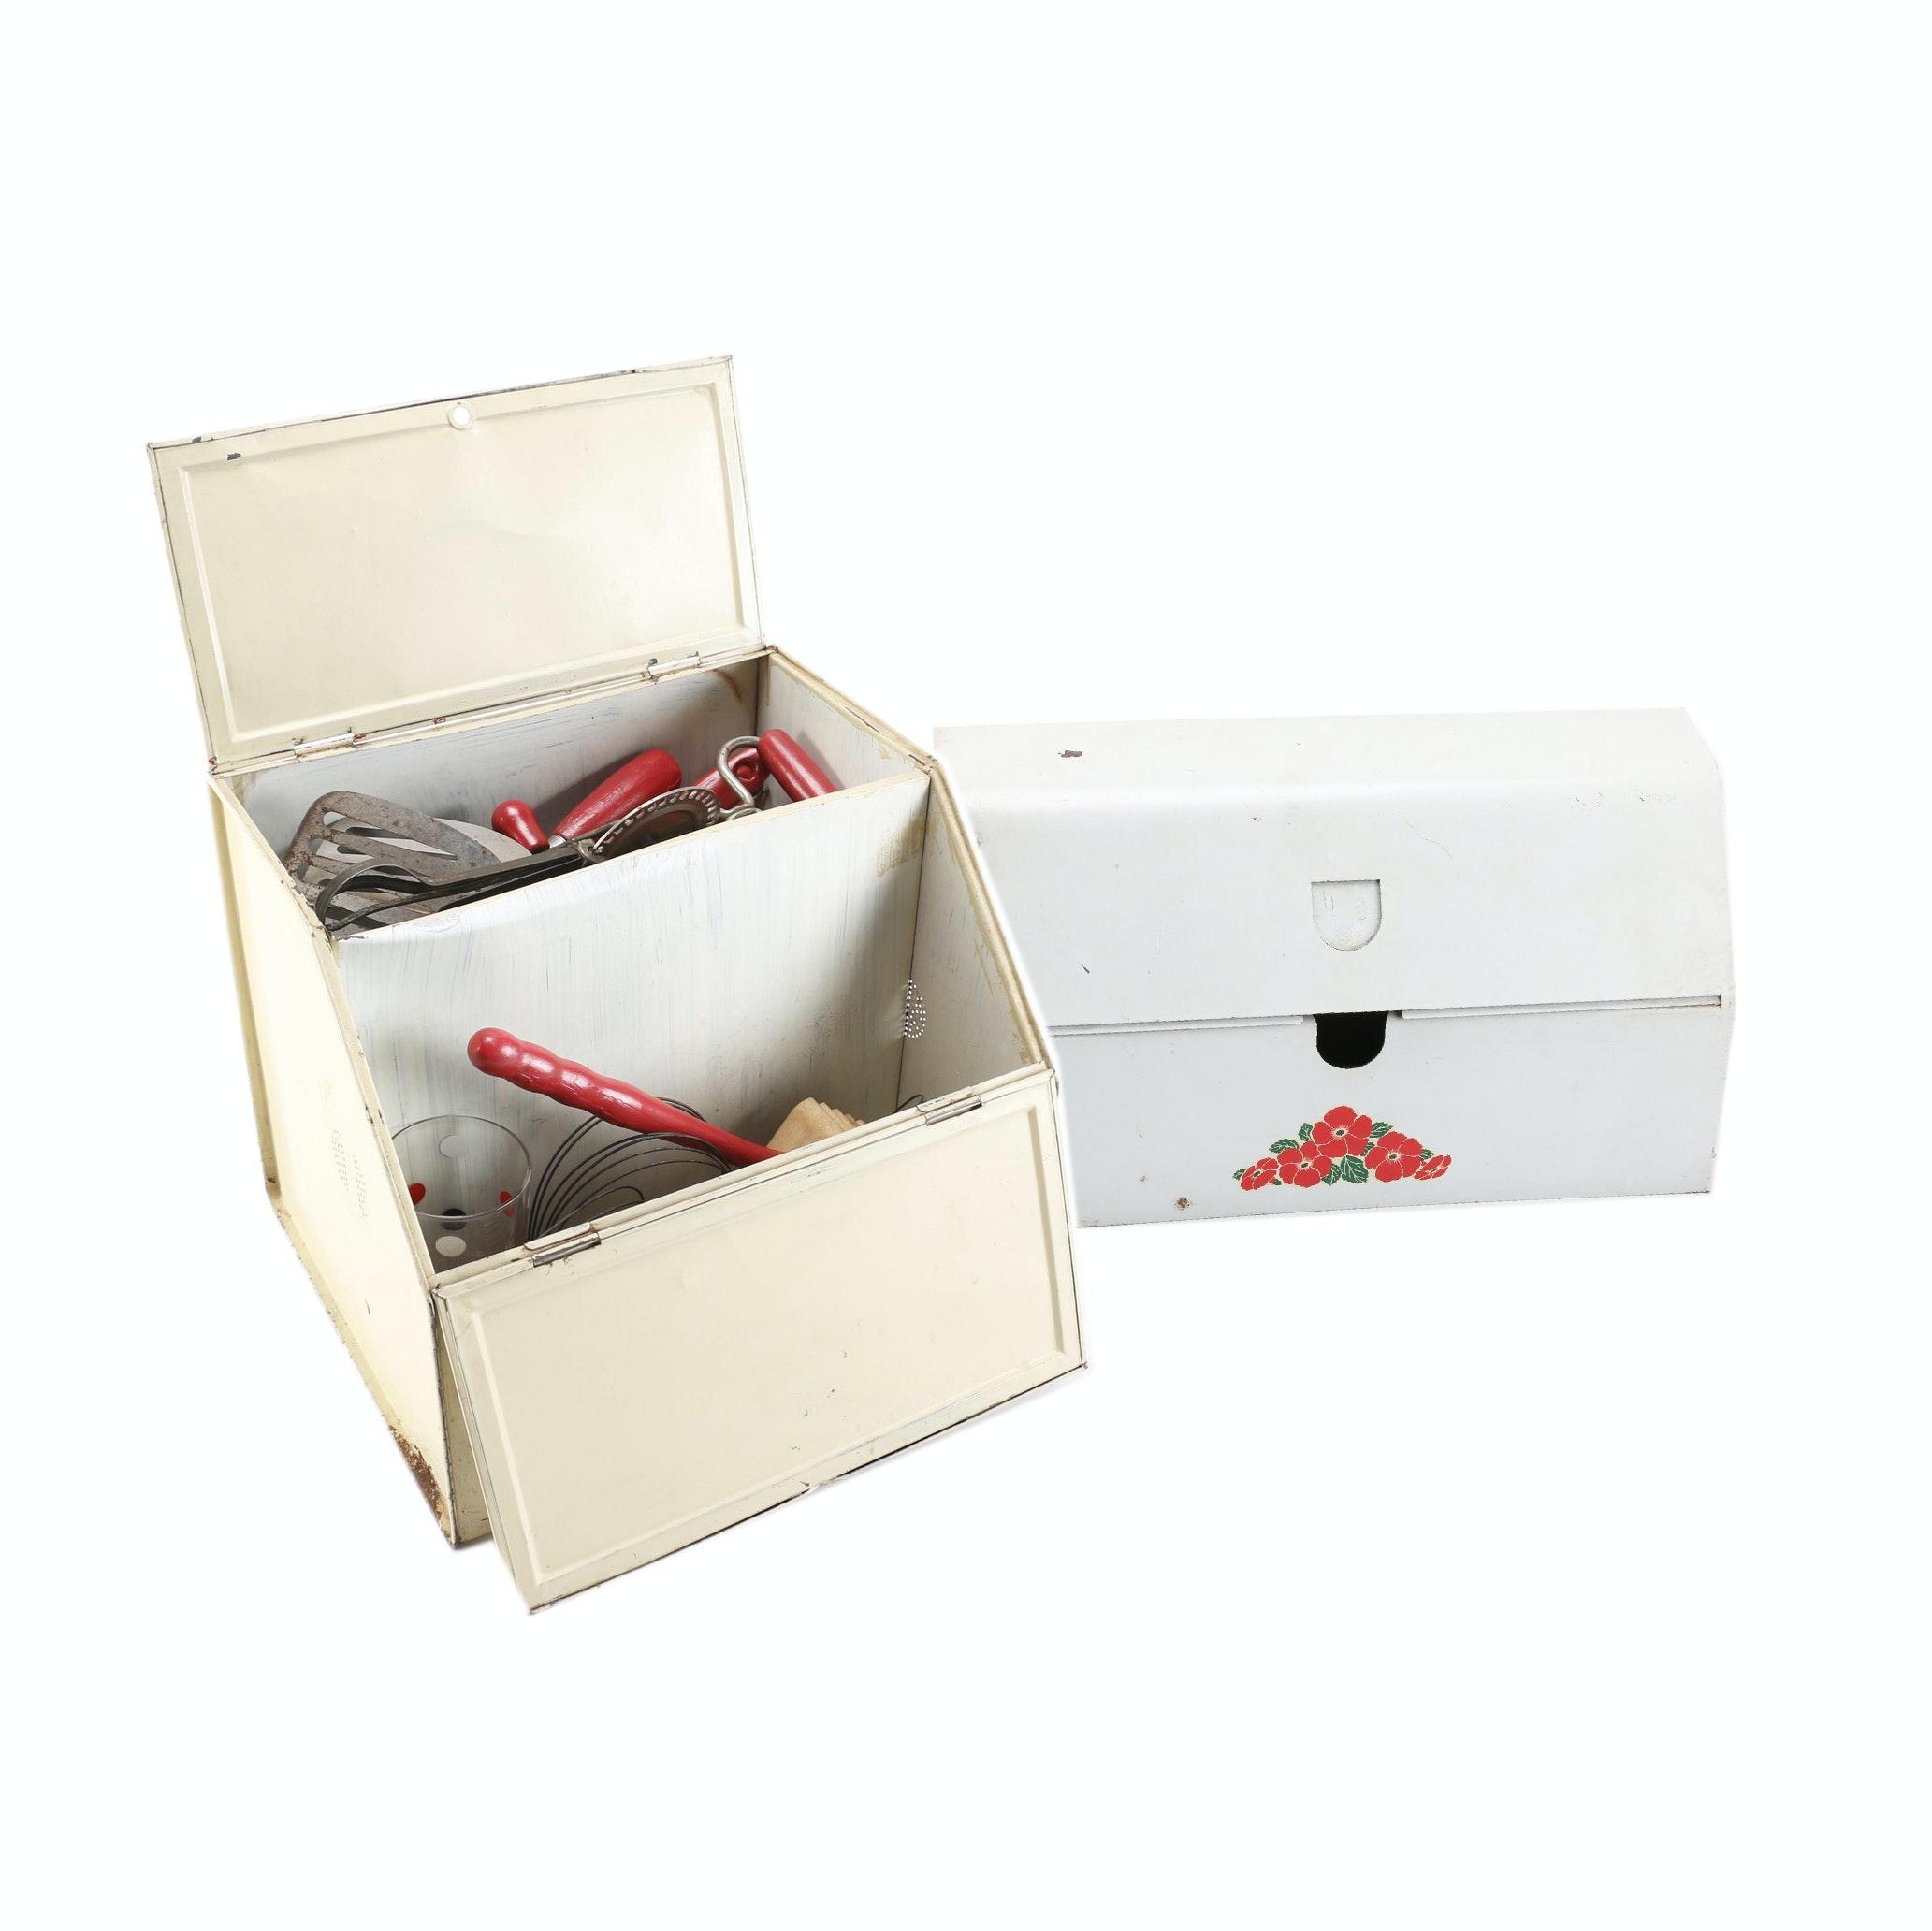 Collection of Vintage Utensils and Kitchen Storage